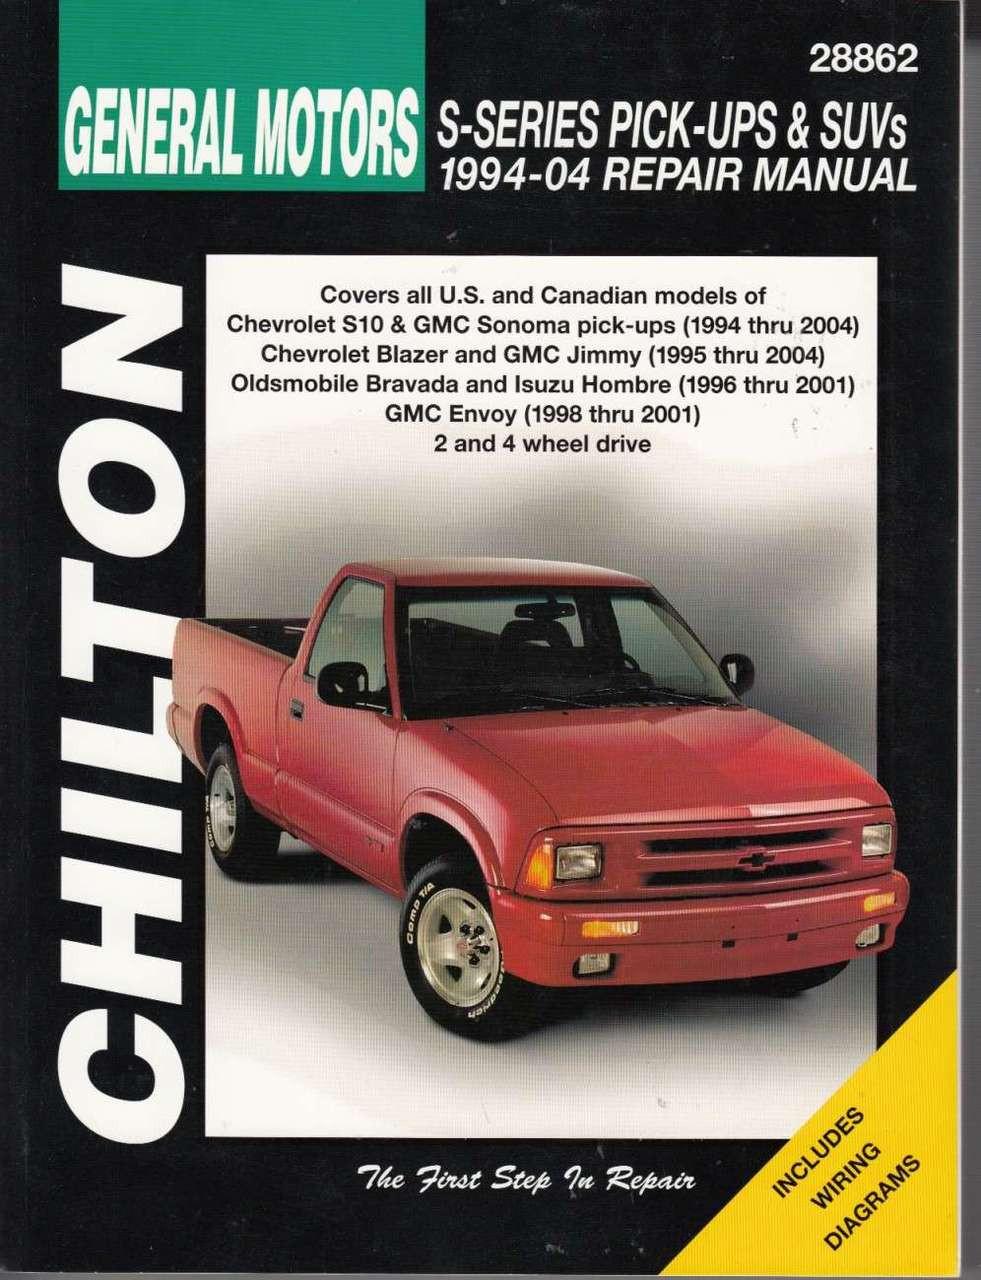 2000 gmc sonoma truck service manual open source user manual u2022 rh dramatic varieties com Fix 2000 GMC Jimmy Shock Fix 2000 GMC Jimmy Shock